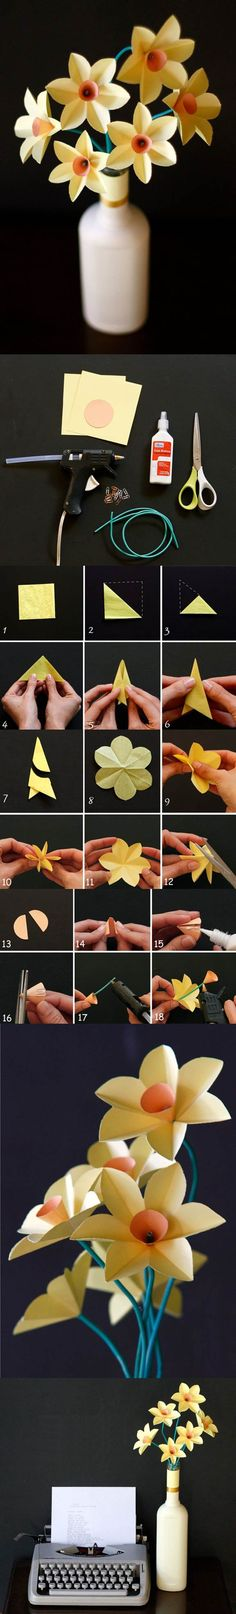 DIY Easy Paper Daffodils   iCreativeIdeas.com LIKE Us on Facebook ==> https://www.facebook.com/icreativeideas